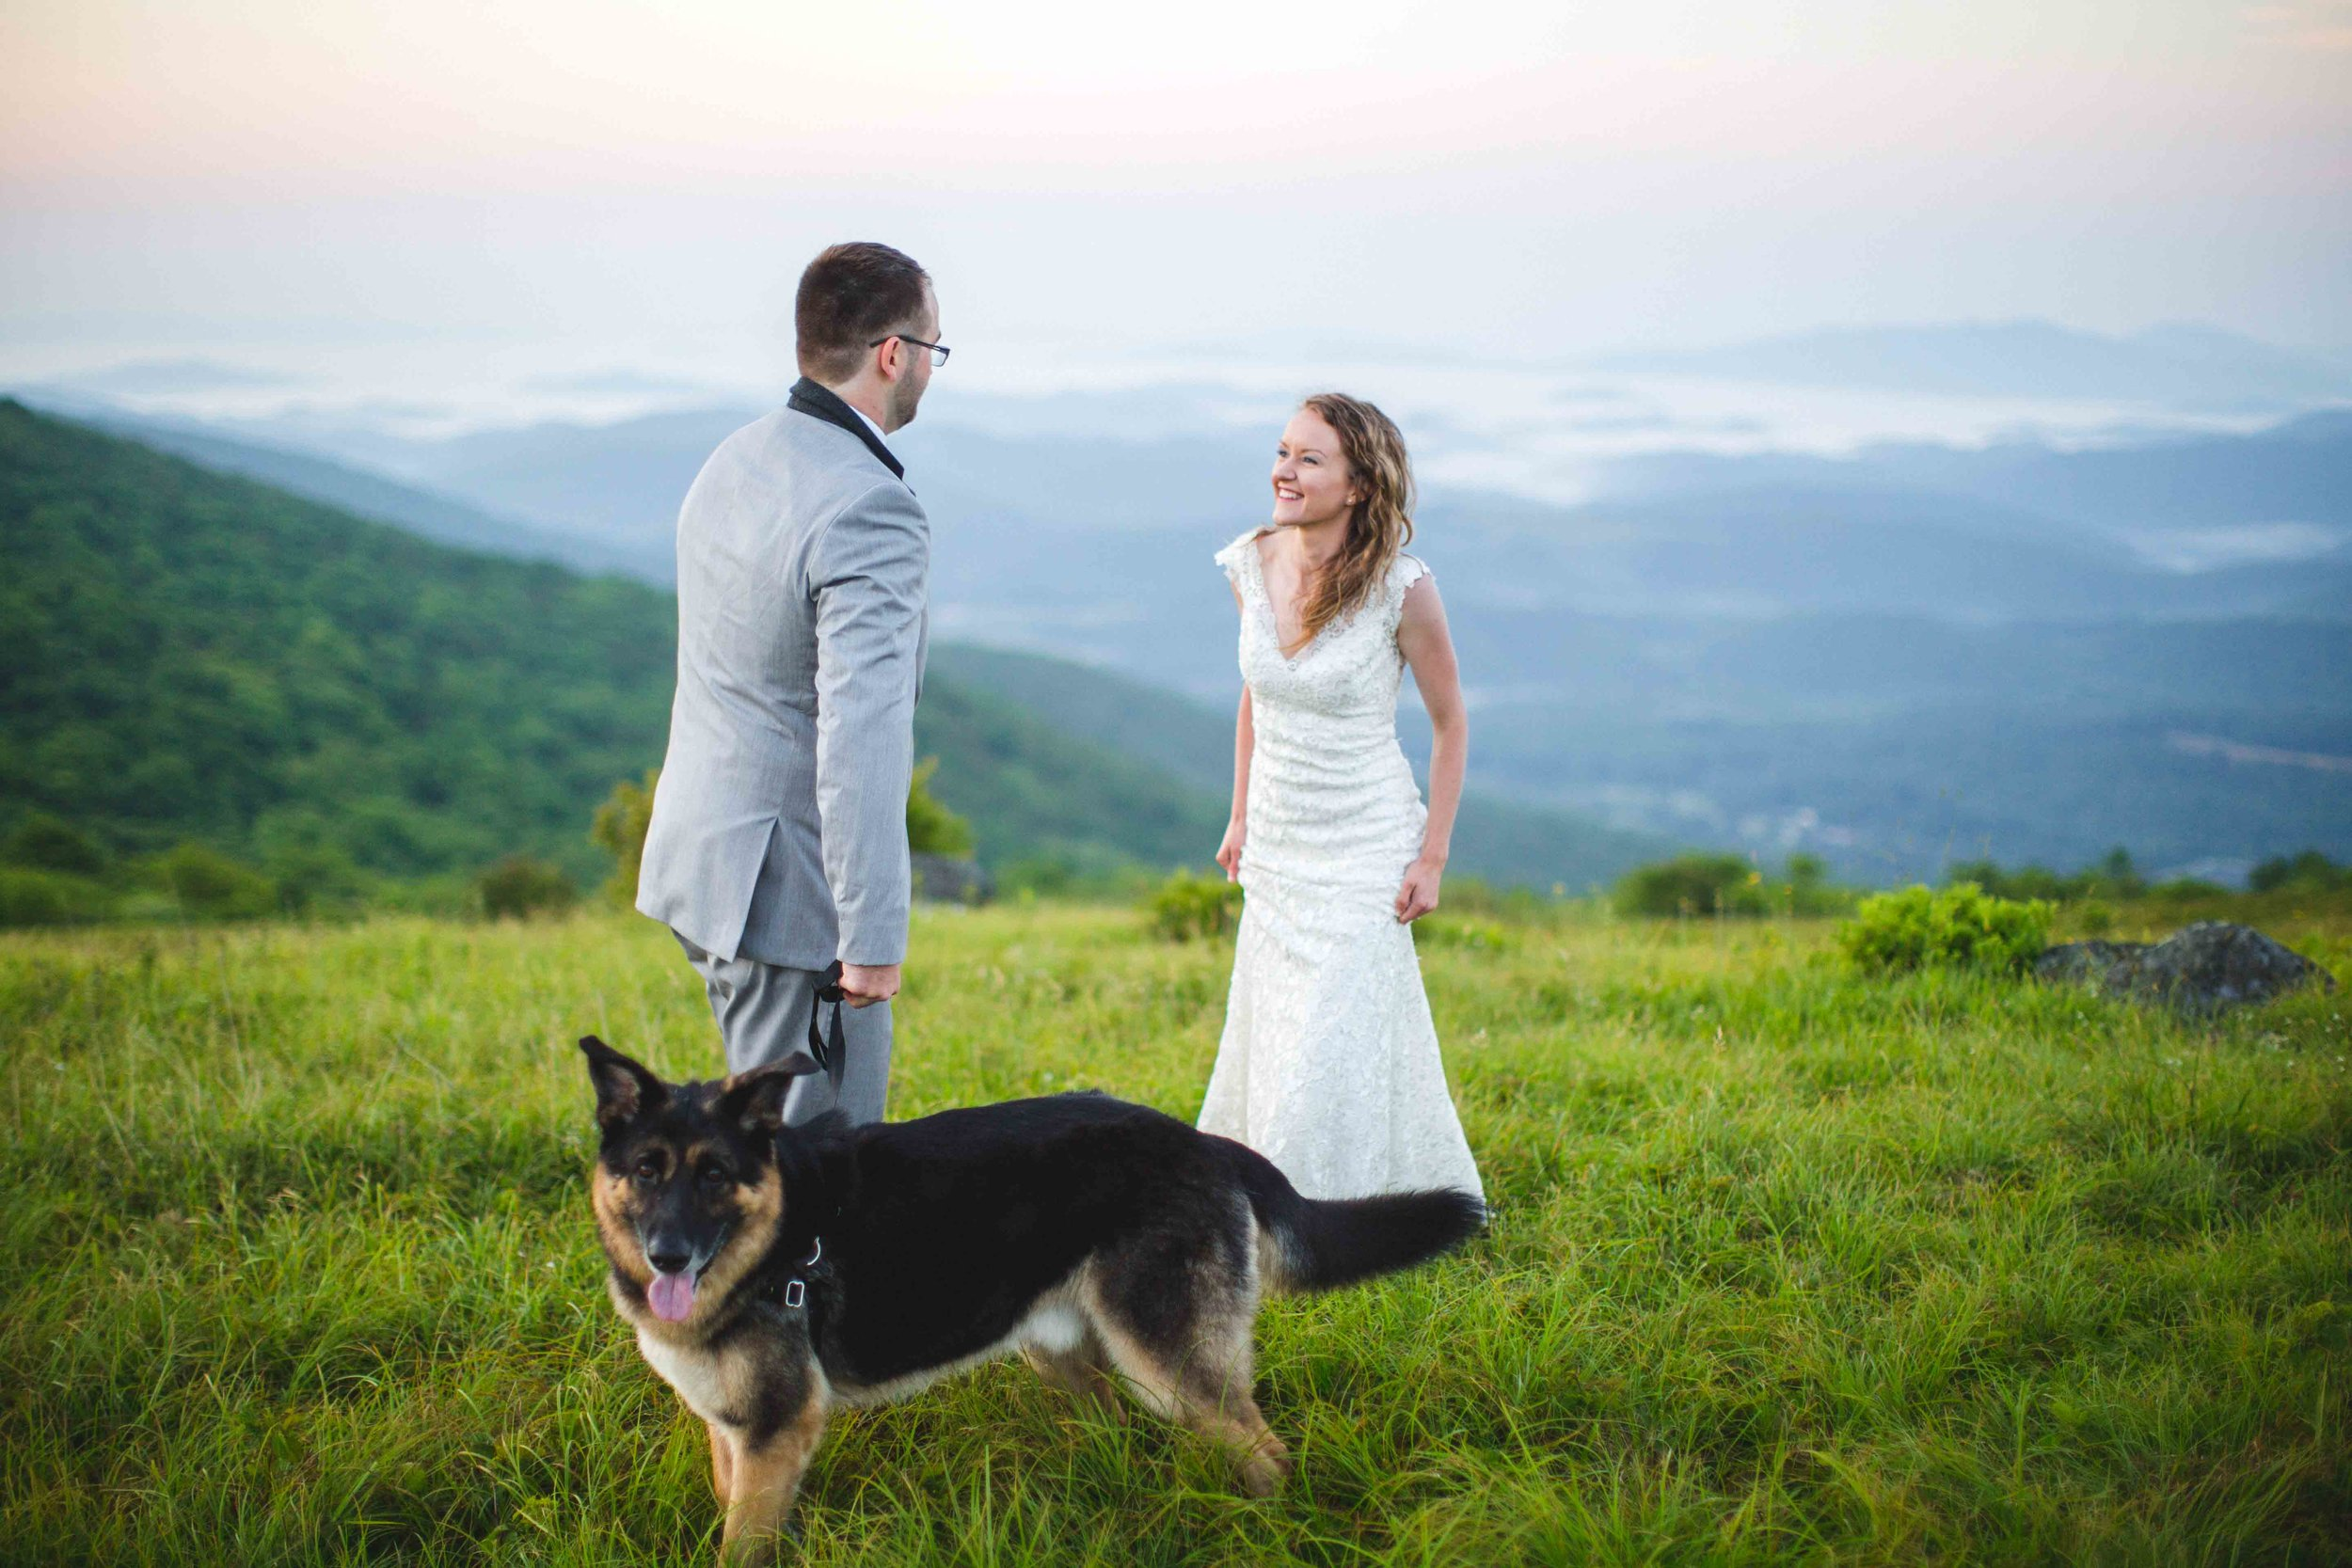 north-carolina-elopement-photographer-22.jpg